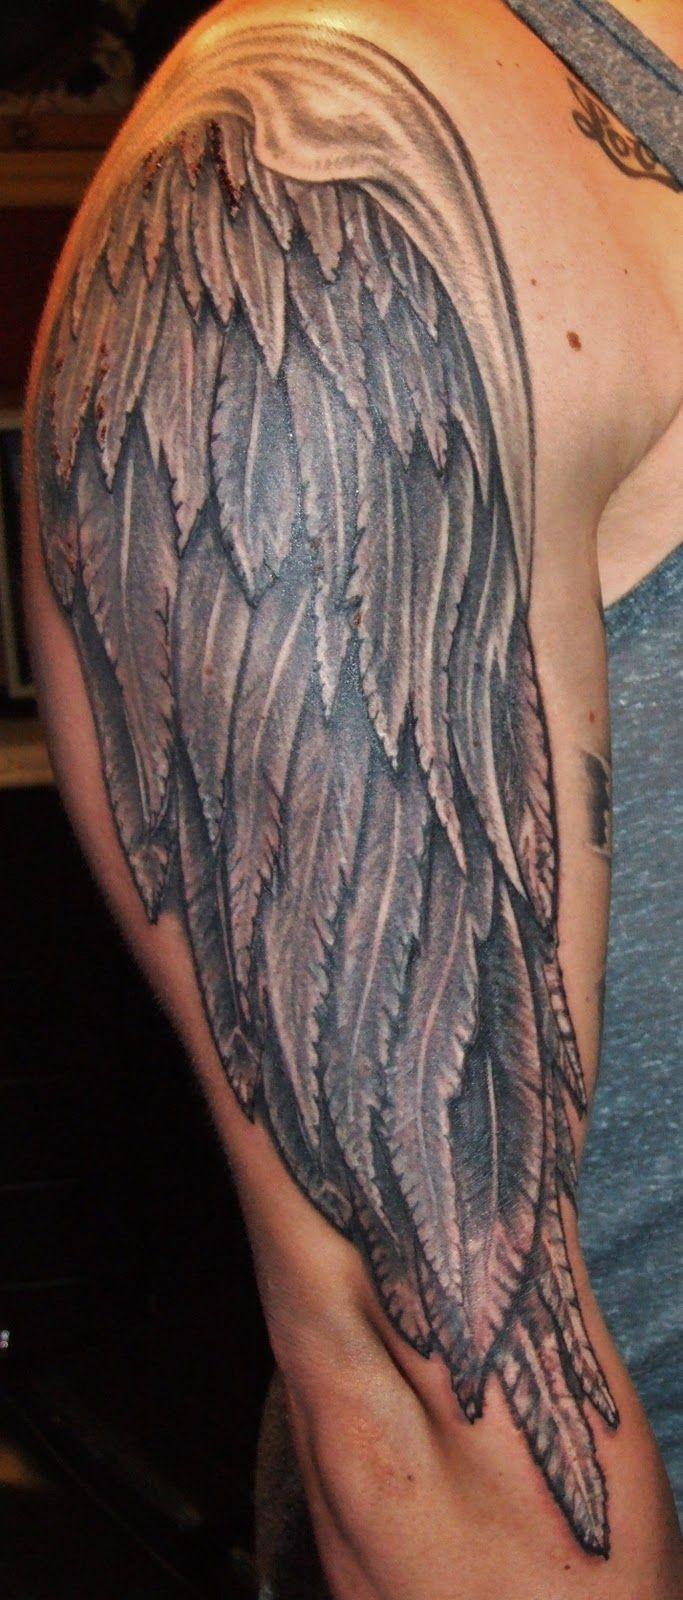 Tattoos Of Wings Full Arm Tattoo Grey Ink Angel Wings Tattoo On inside measurements 683 X 1600